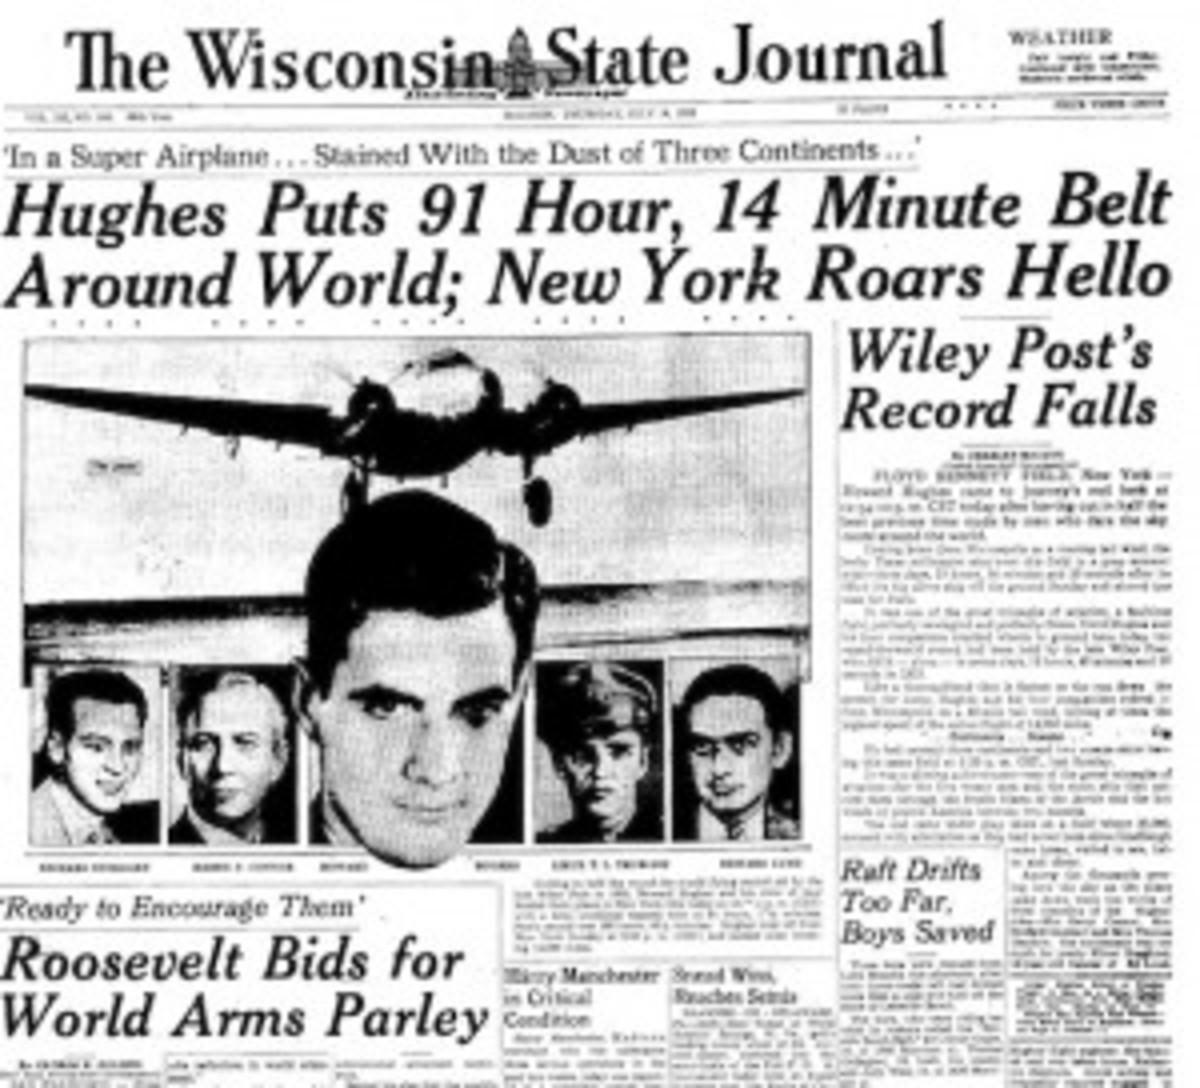 1938-July-14-Wisconsin-State-Journal-Madison-WI-sm-300x272